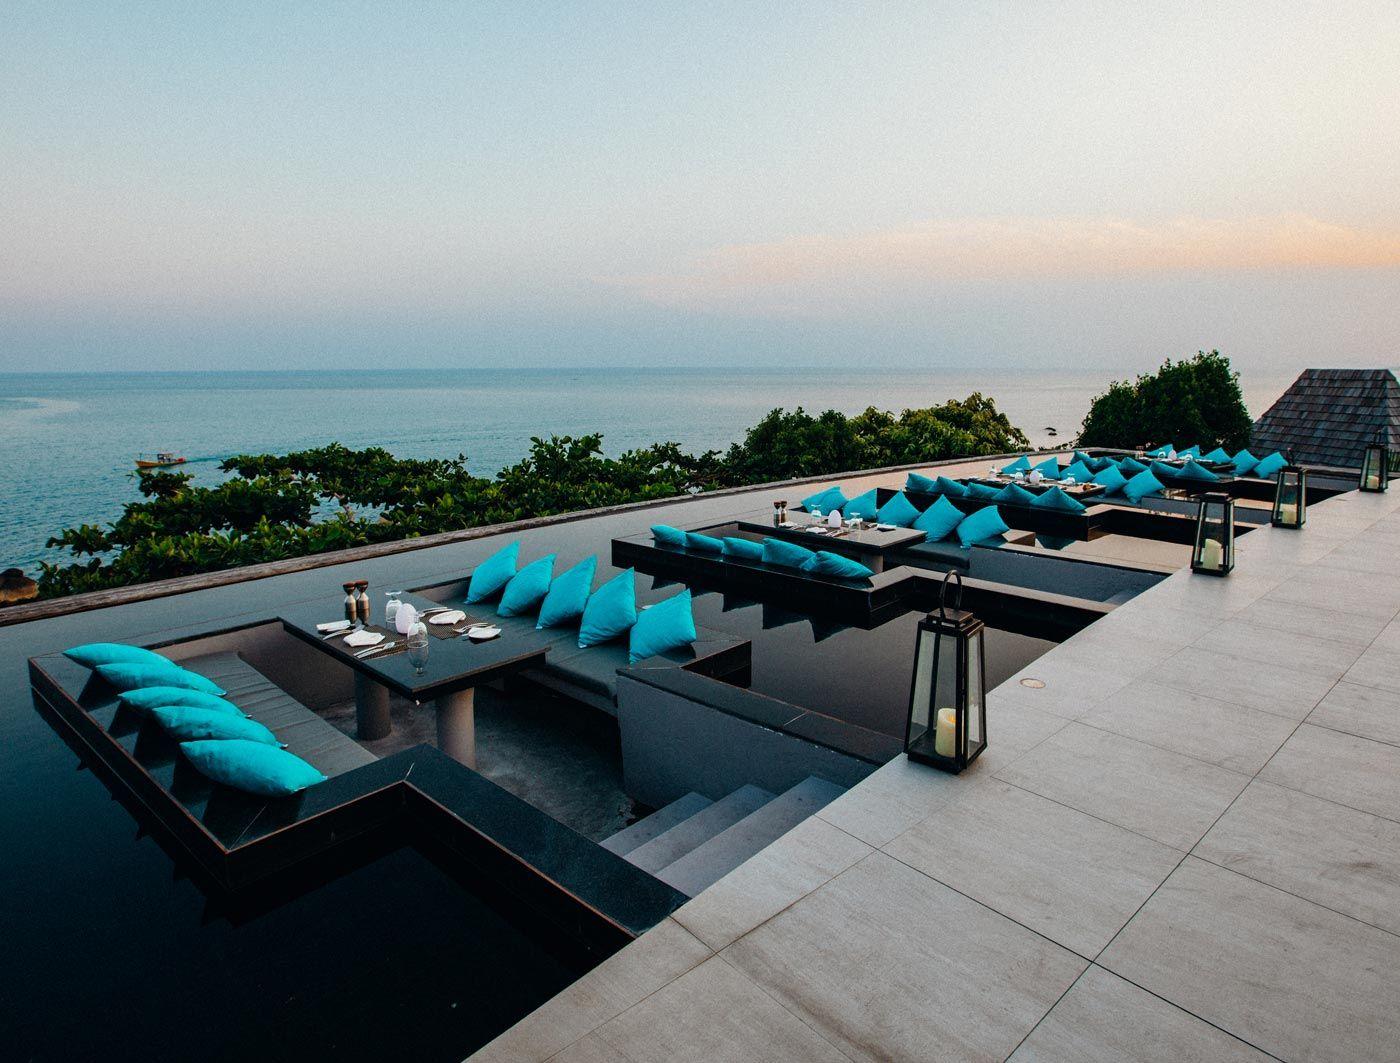 Silavadee Pool Spa Resort In Koh Samui Thailand Resort Pools Thailand Resorts Resort